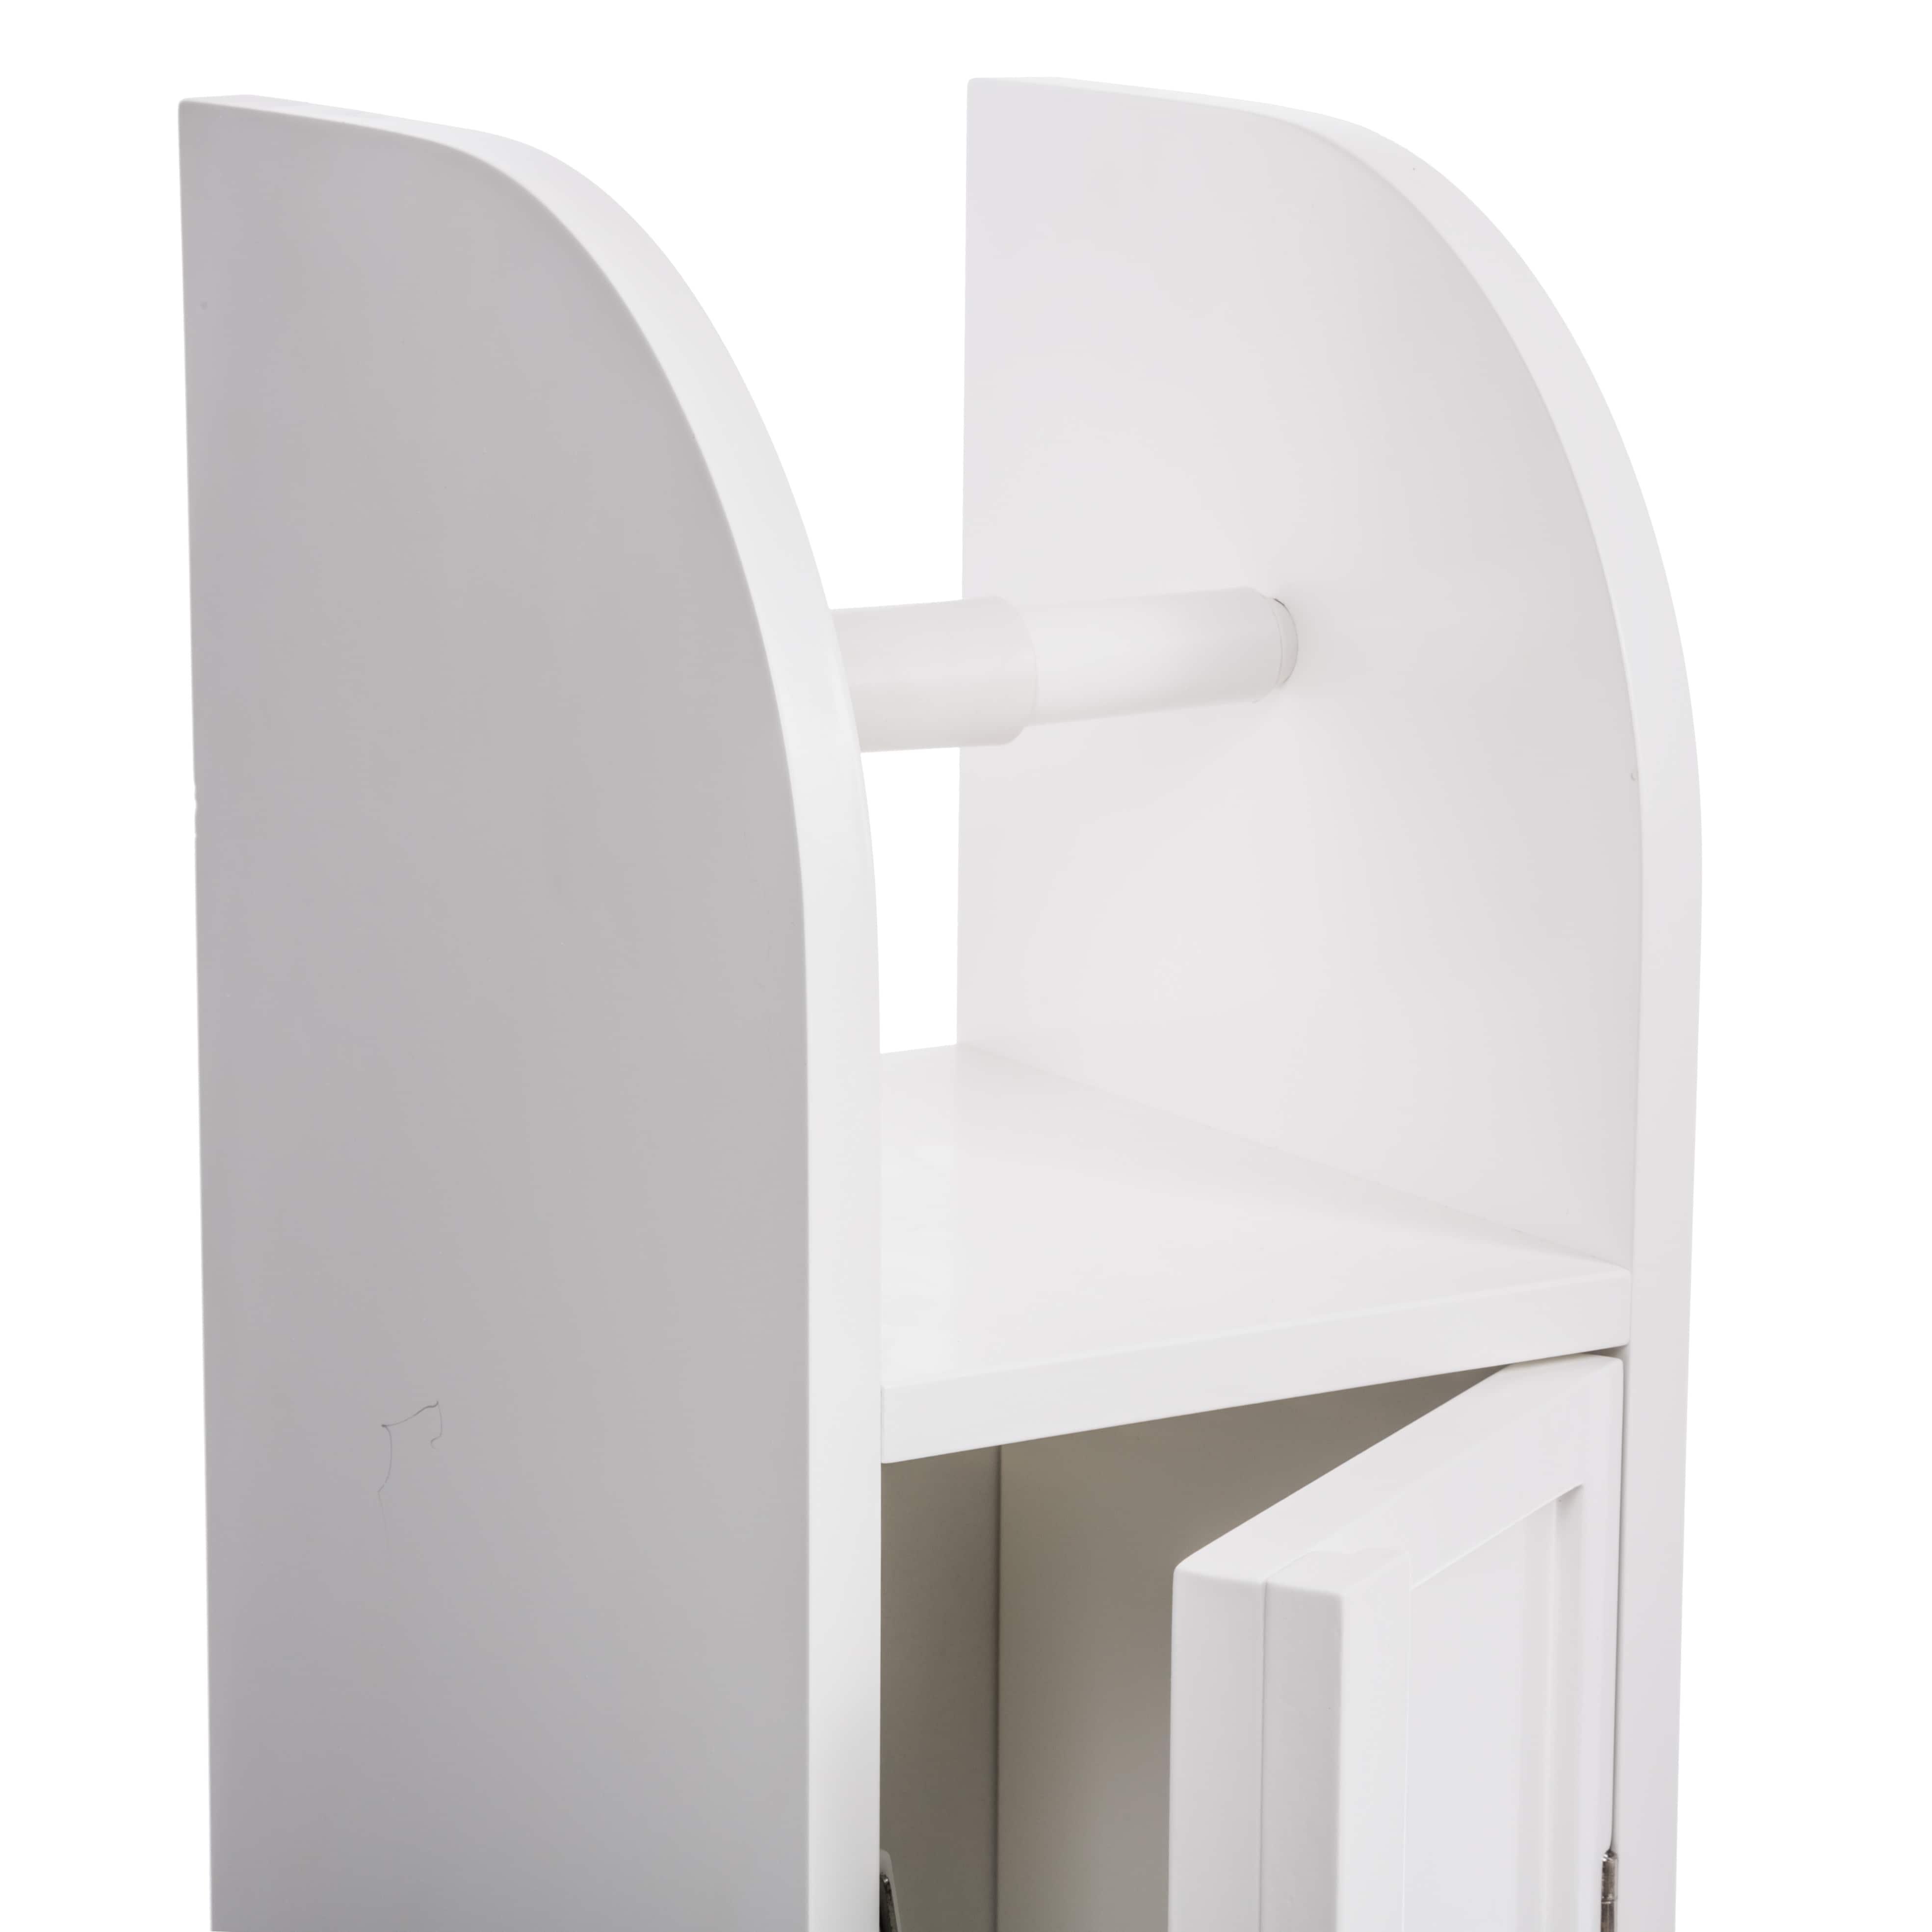 Toiletrolhouder met toiletroldispenser - 20x18x79 cm - Wit